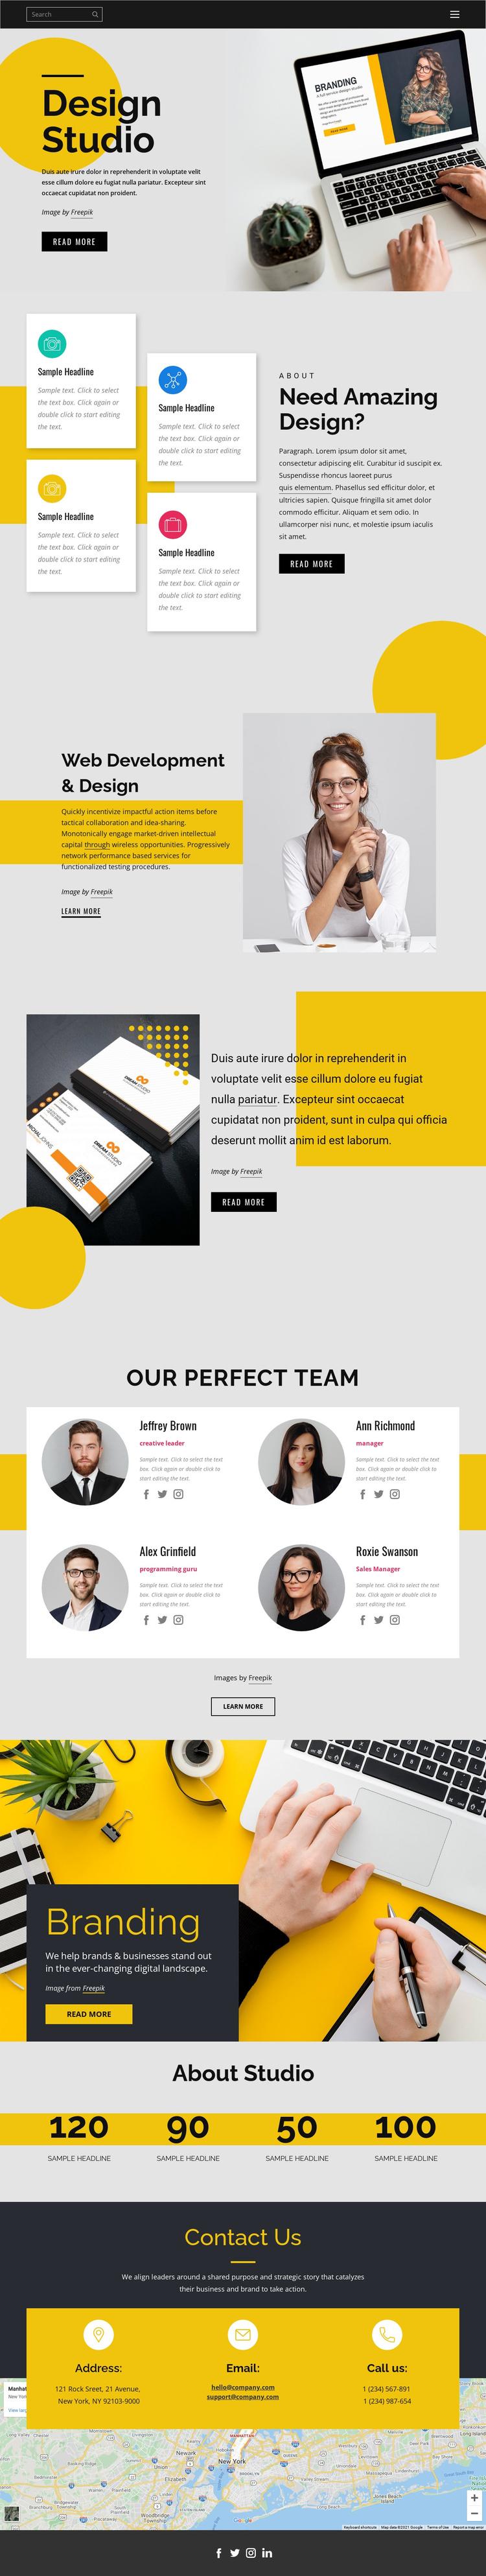 Brand, print & web design Joomla Template